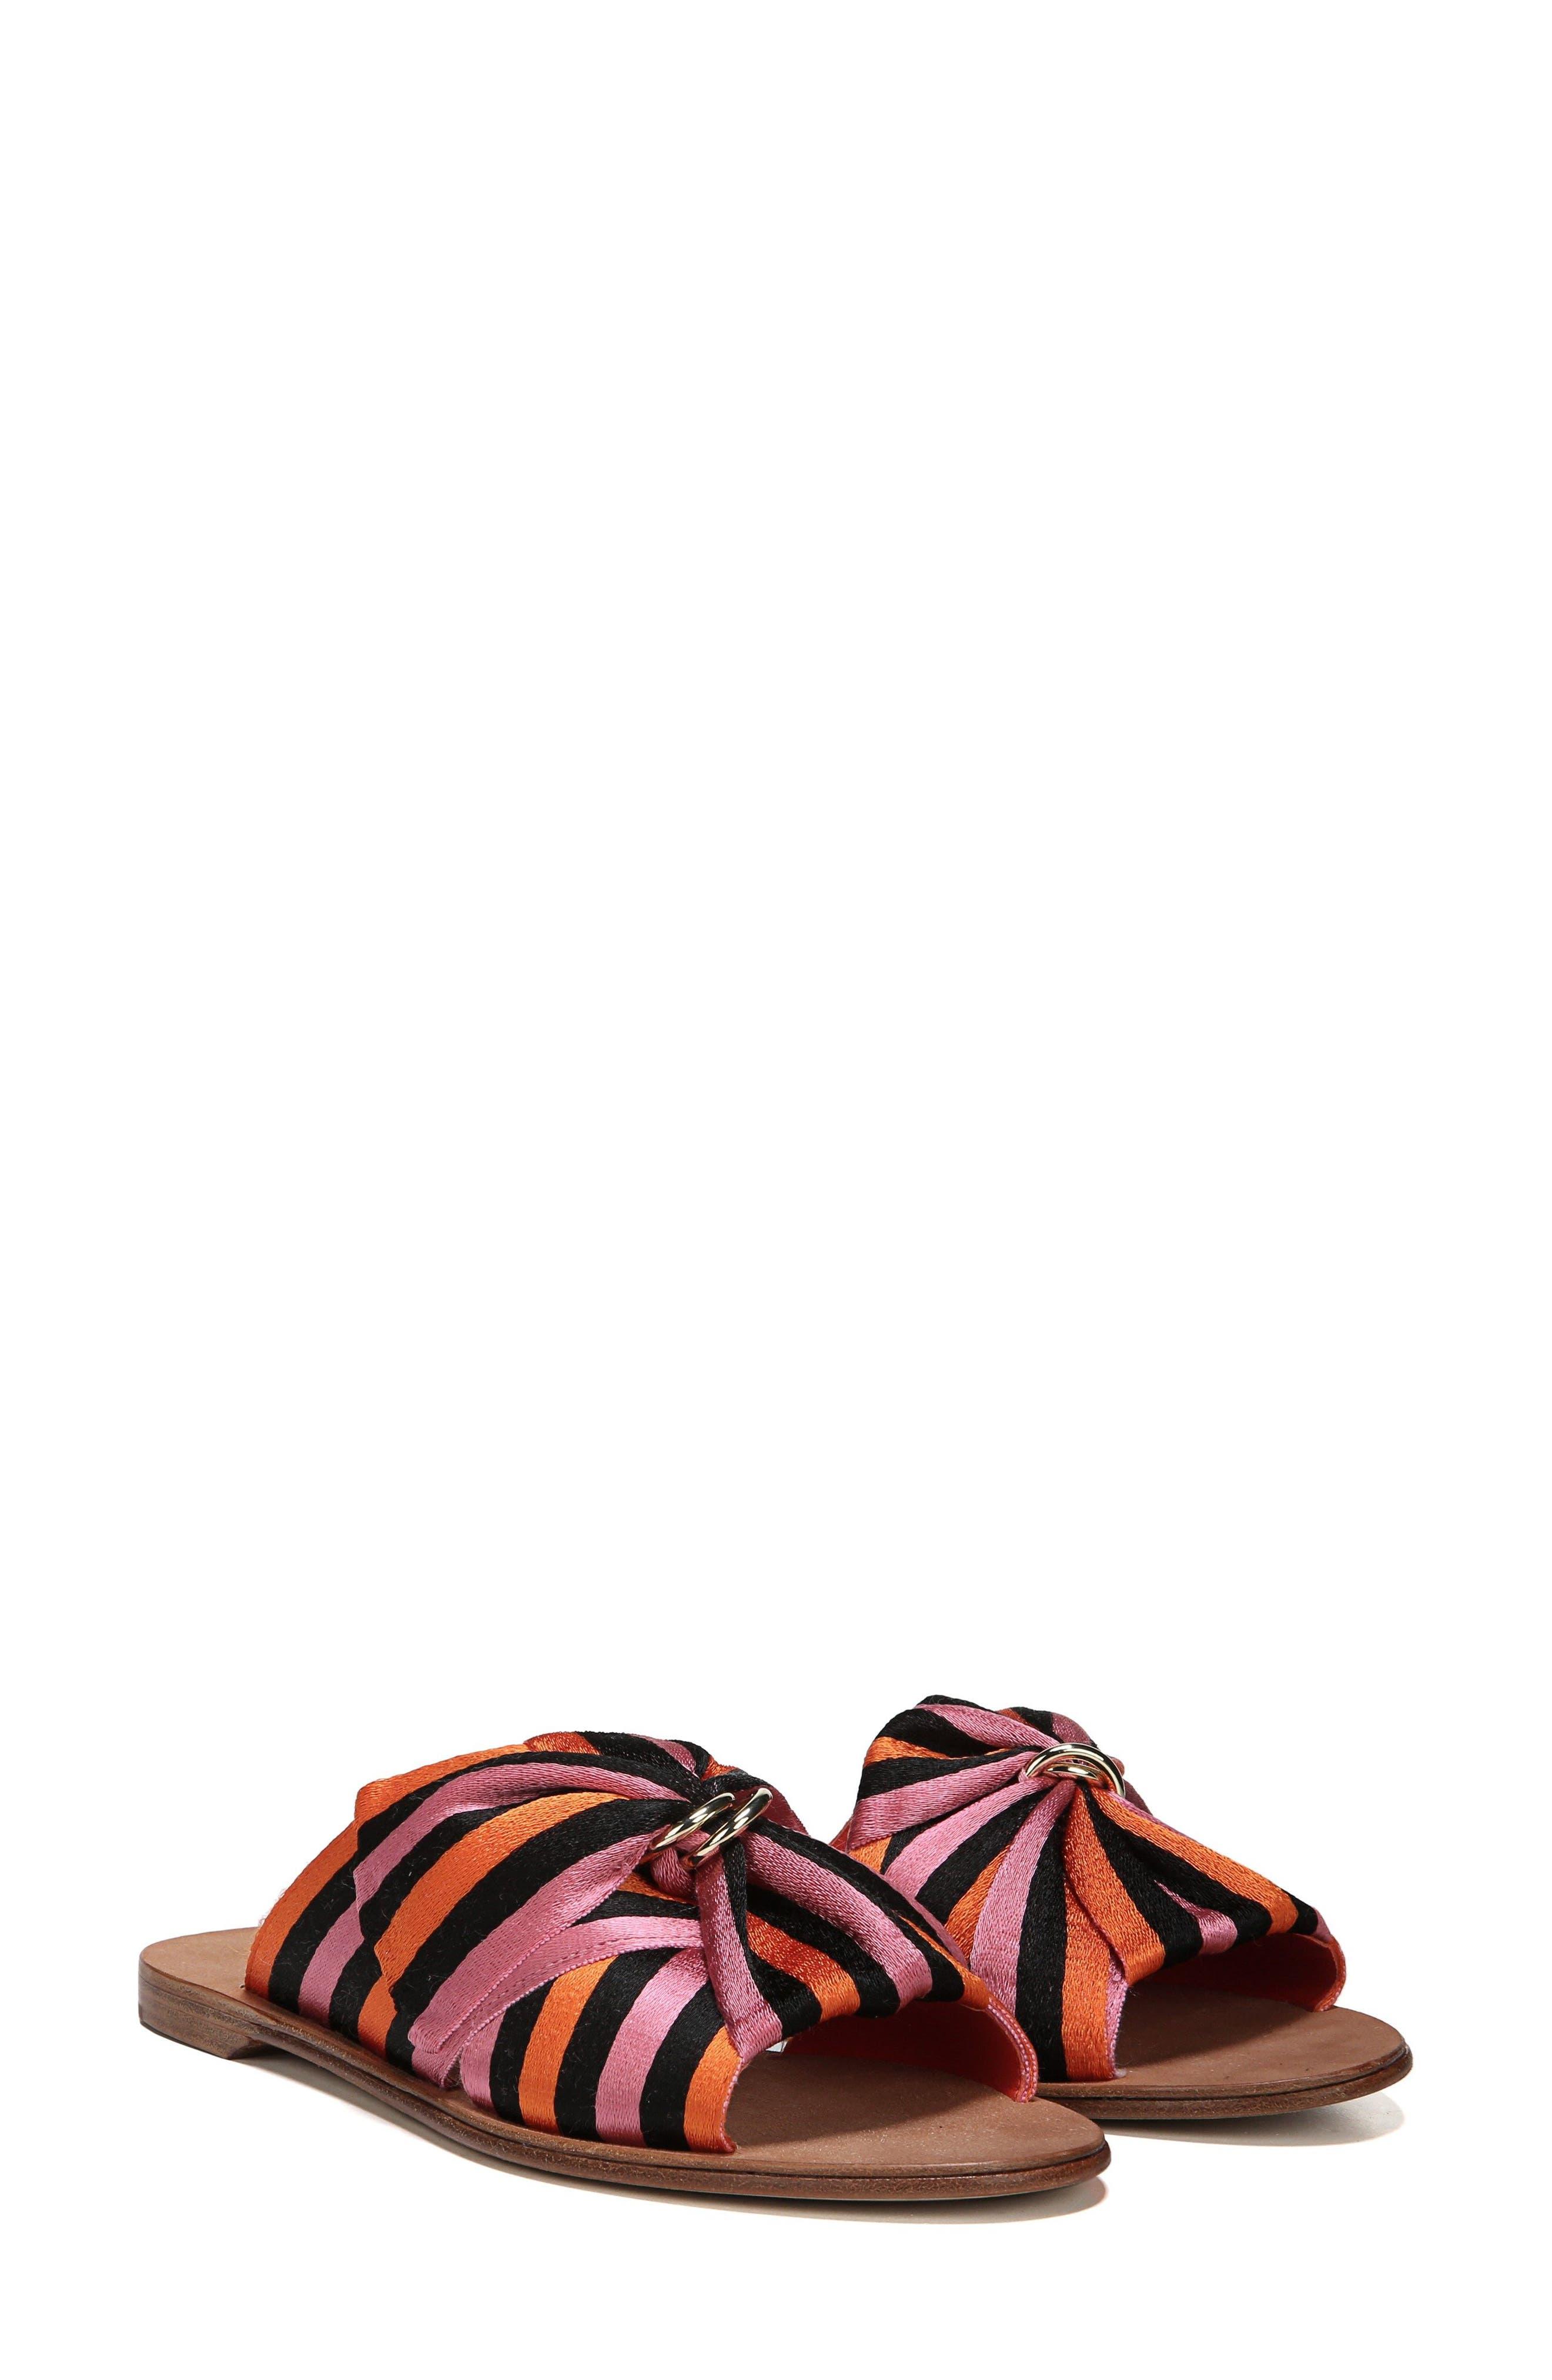 Bella Asymmetrical Slide Sandal,                             Main thumbnail 2, color,